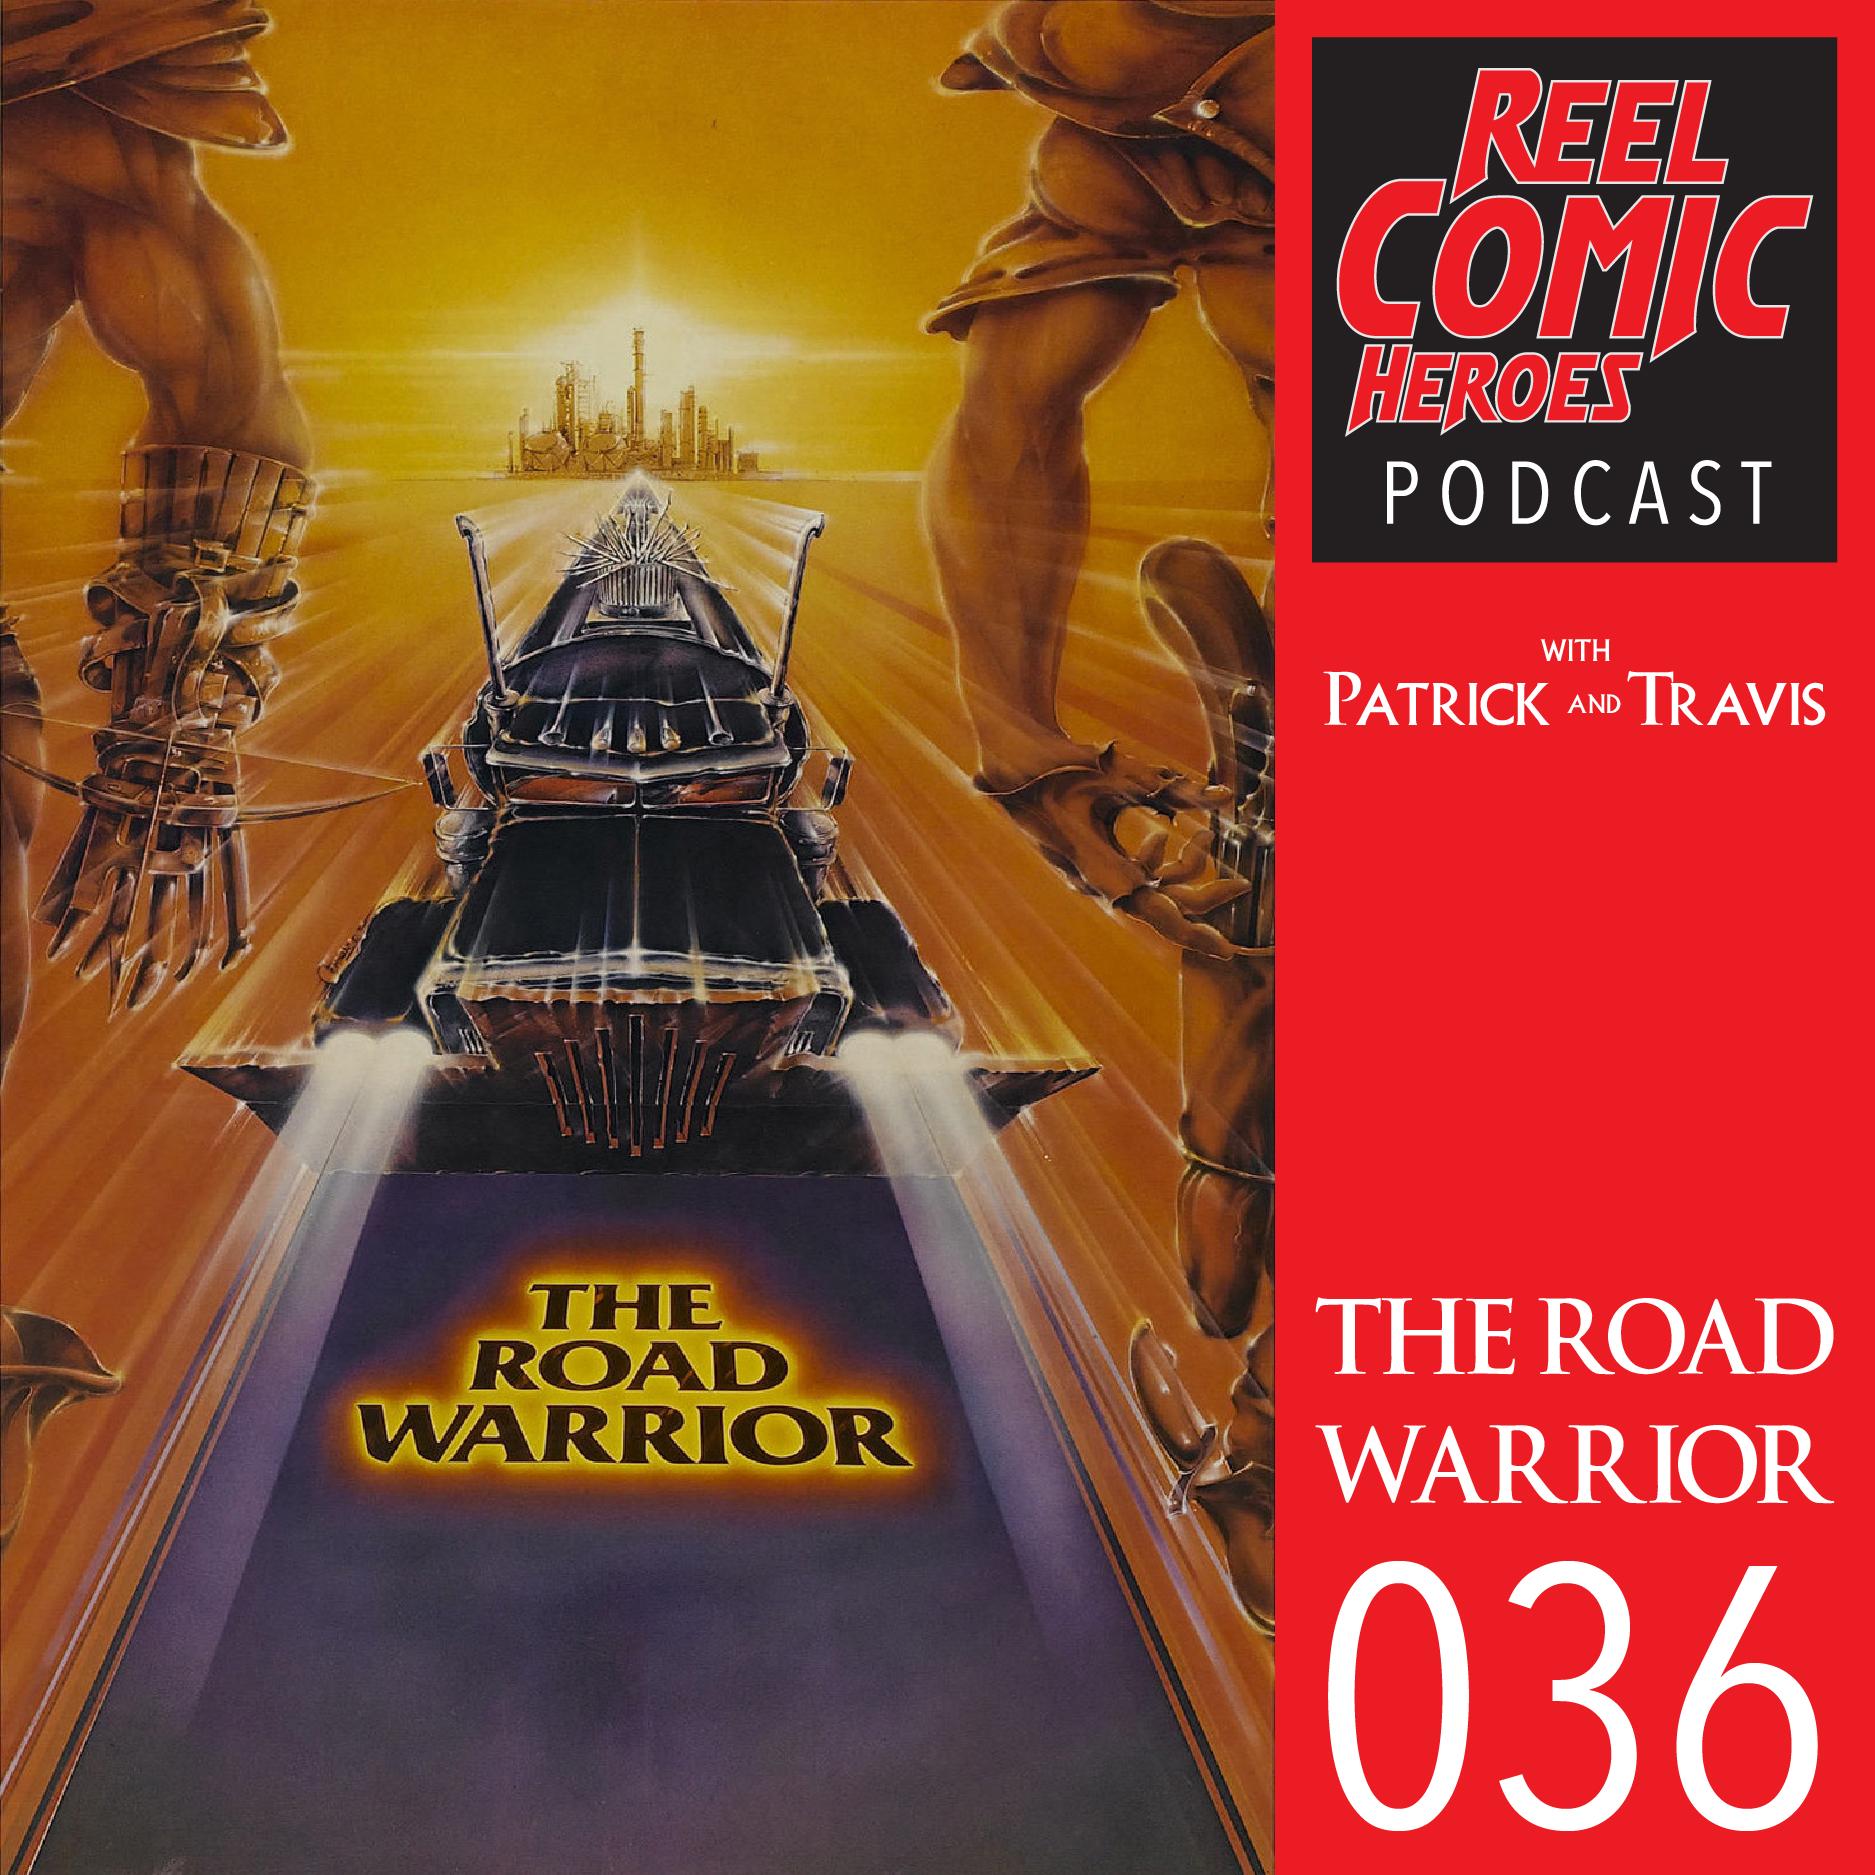 Artwork for Reel Comic Heroes 036 - The Road Warrior